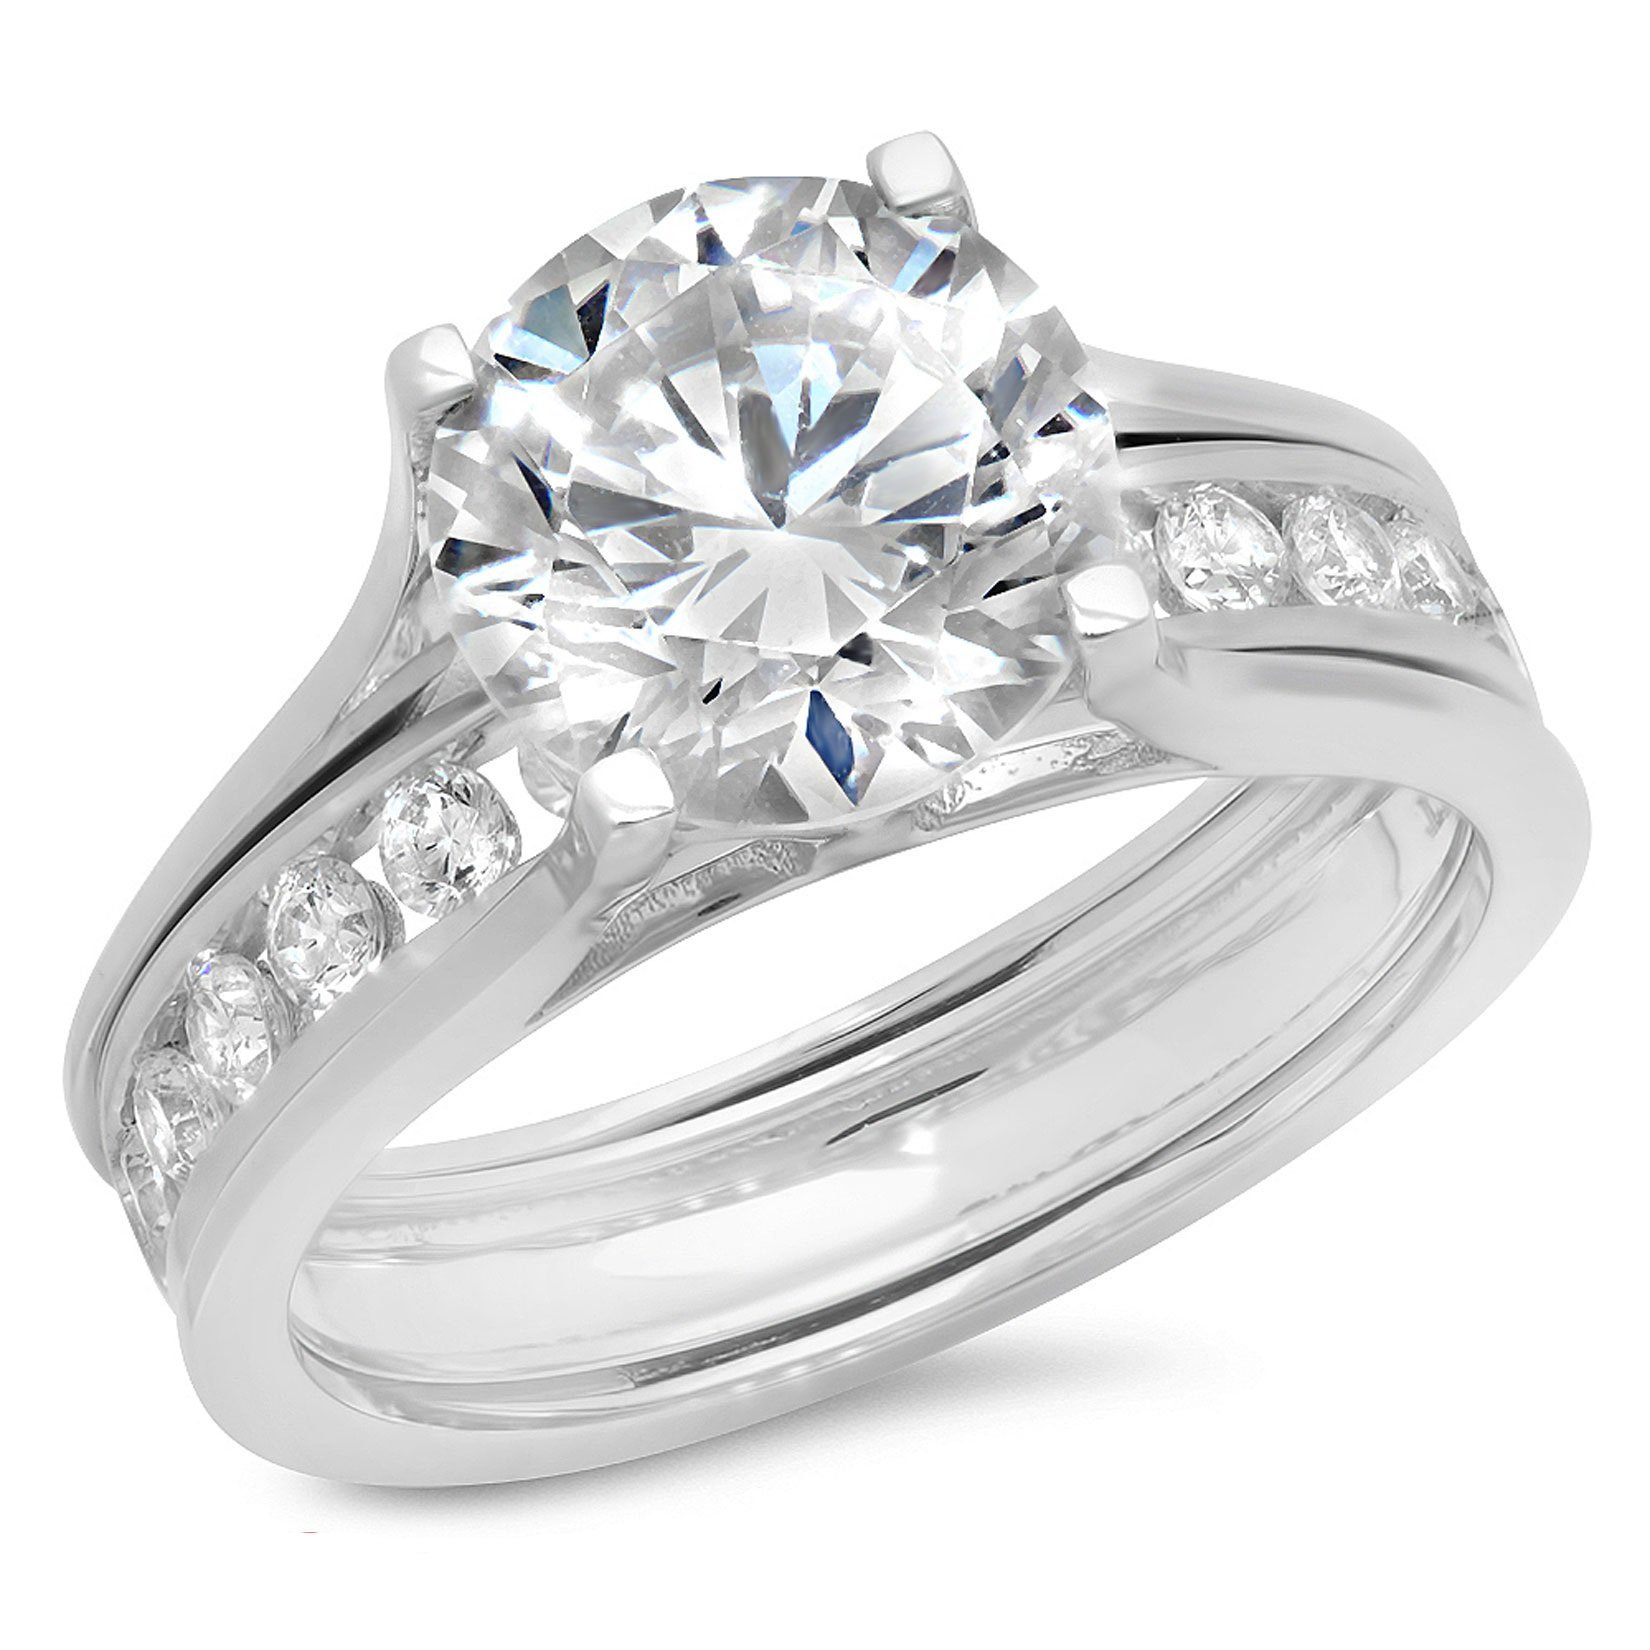 Clara Pucci 2.89 CT Round Cut CZ Halo Bridal Engagement Wedding Ring Sliding Band Set 14k White Gold, Size 7.5 by Clara Pucci